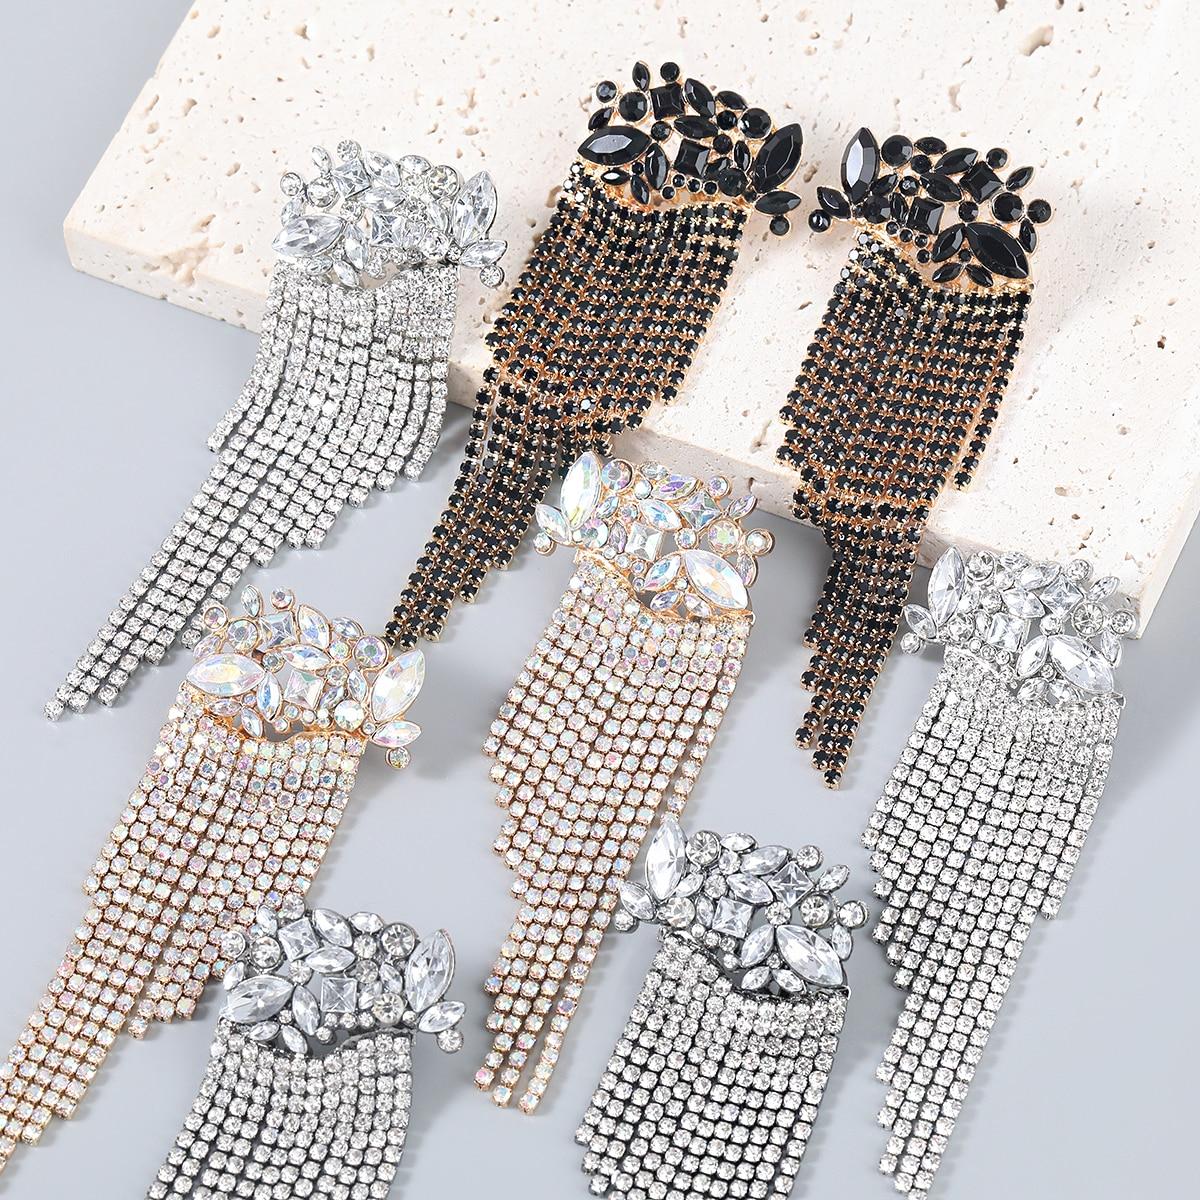 AliExpress - JIJIAWENHUA New Sparkling Rhinestone Tassel Pendant Women's Earrings Dinner Party Wedding Fashion Jewelry Accessories